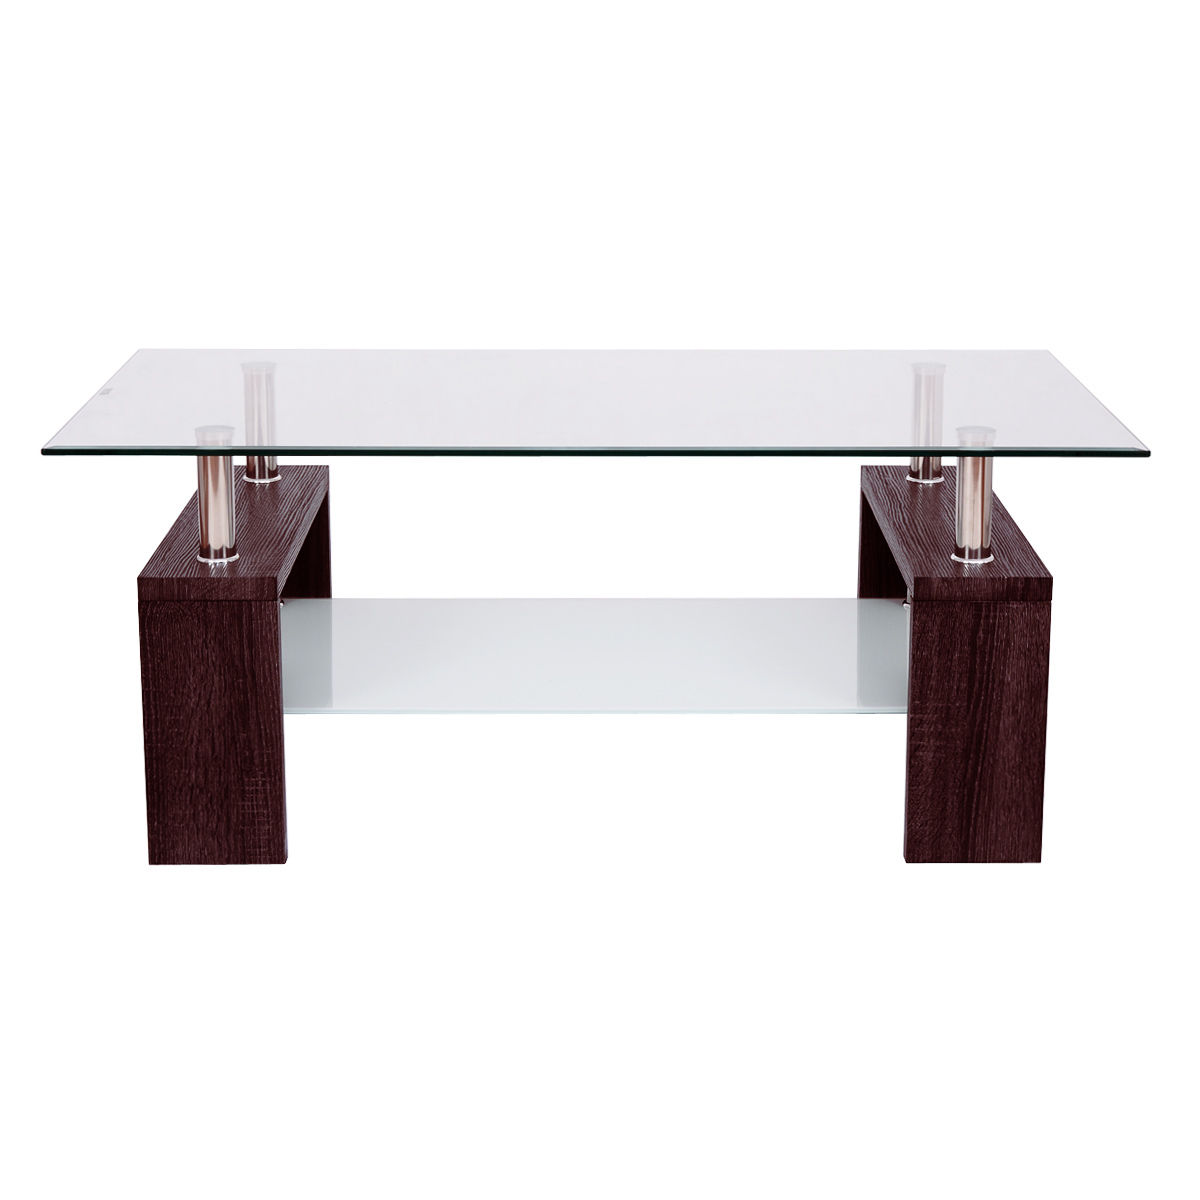 Giantex Rectangular Tempered Glass Coffee Table with Storage Shelf ...